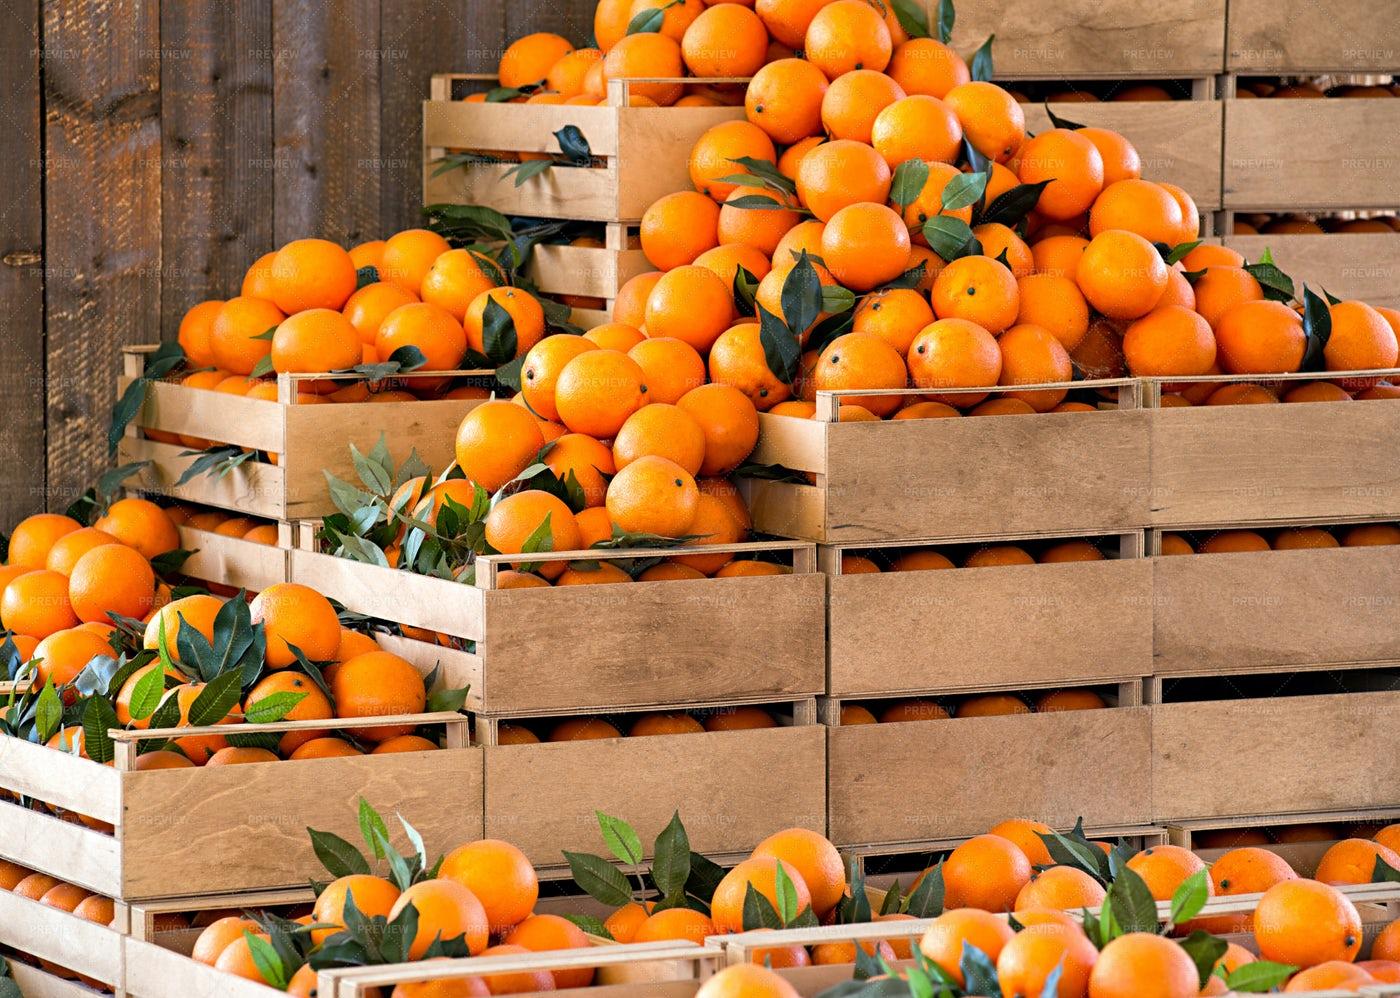 Wooden Crates Of Oranges: Stock Photos